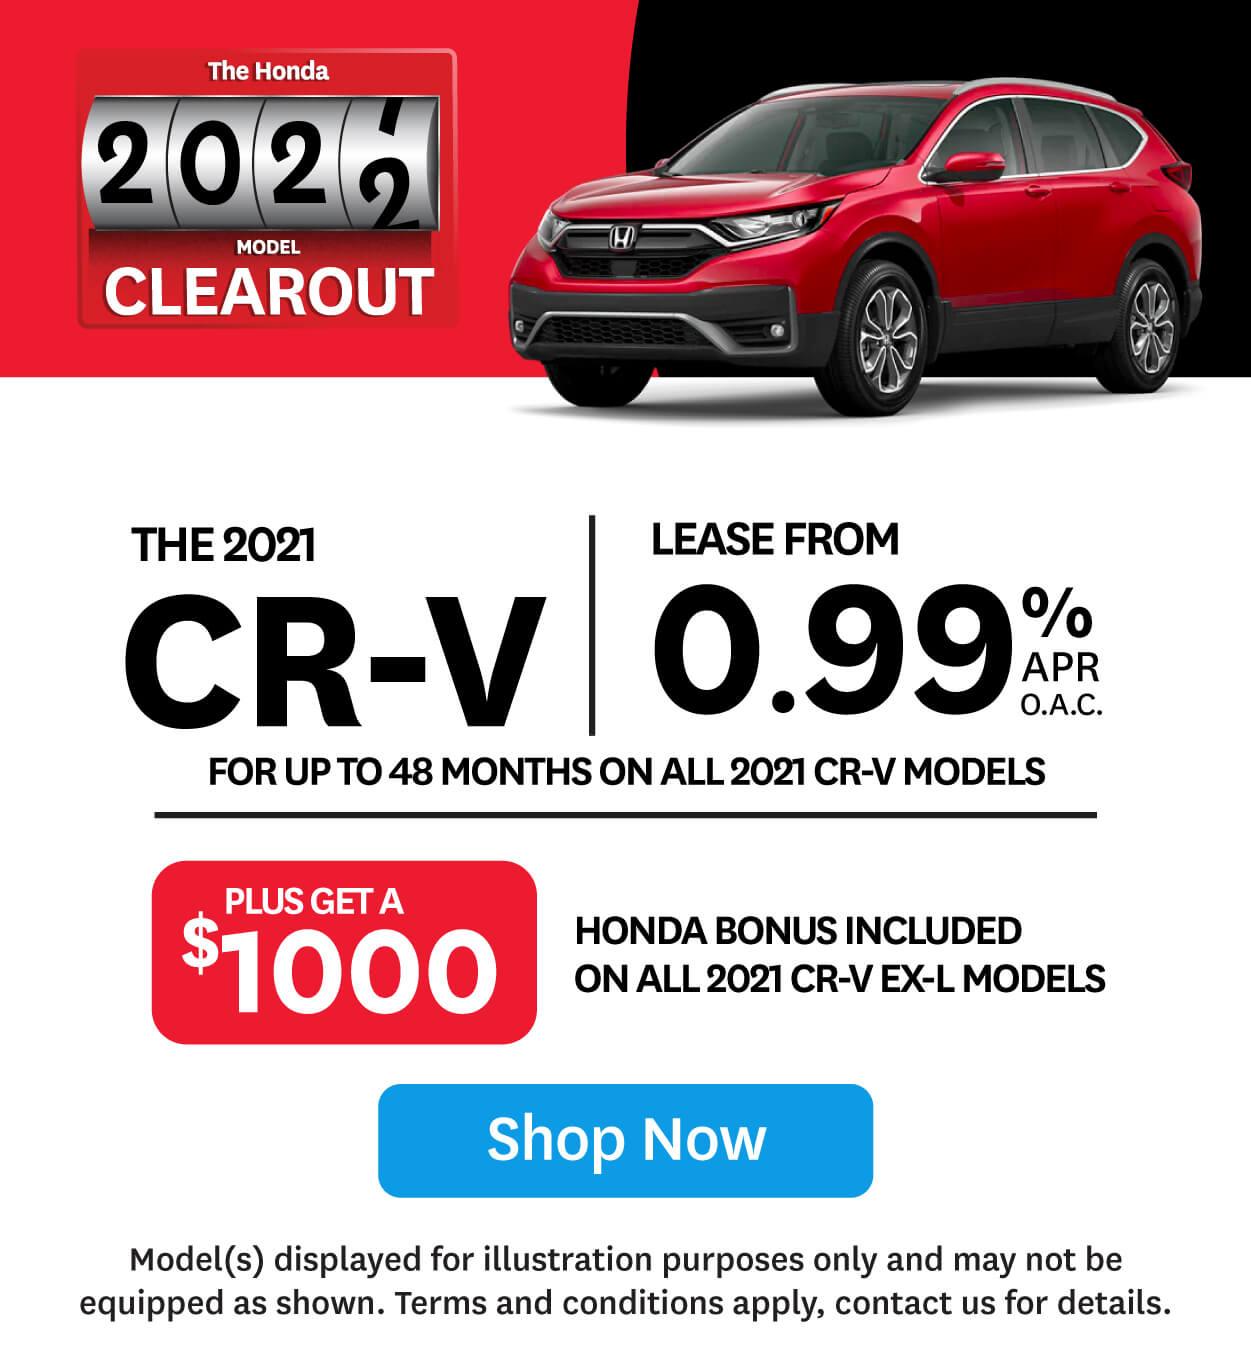 Orangeville Honda CR-V 2021 Clearout